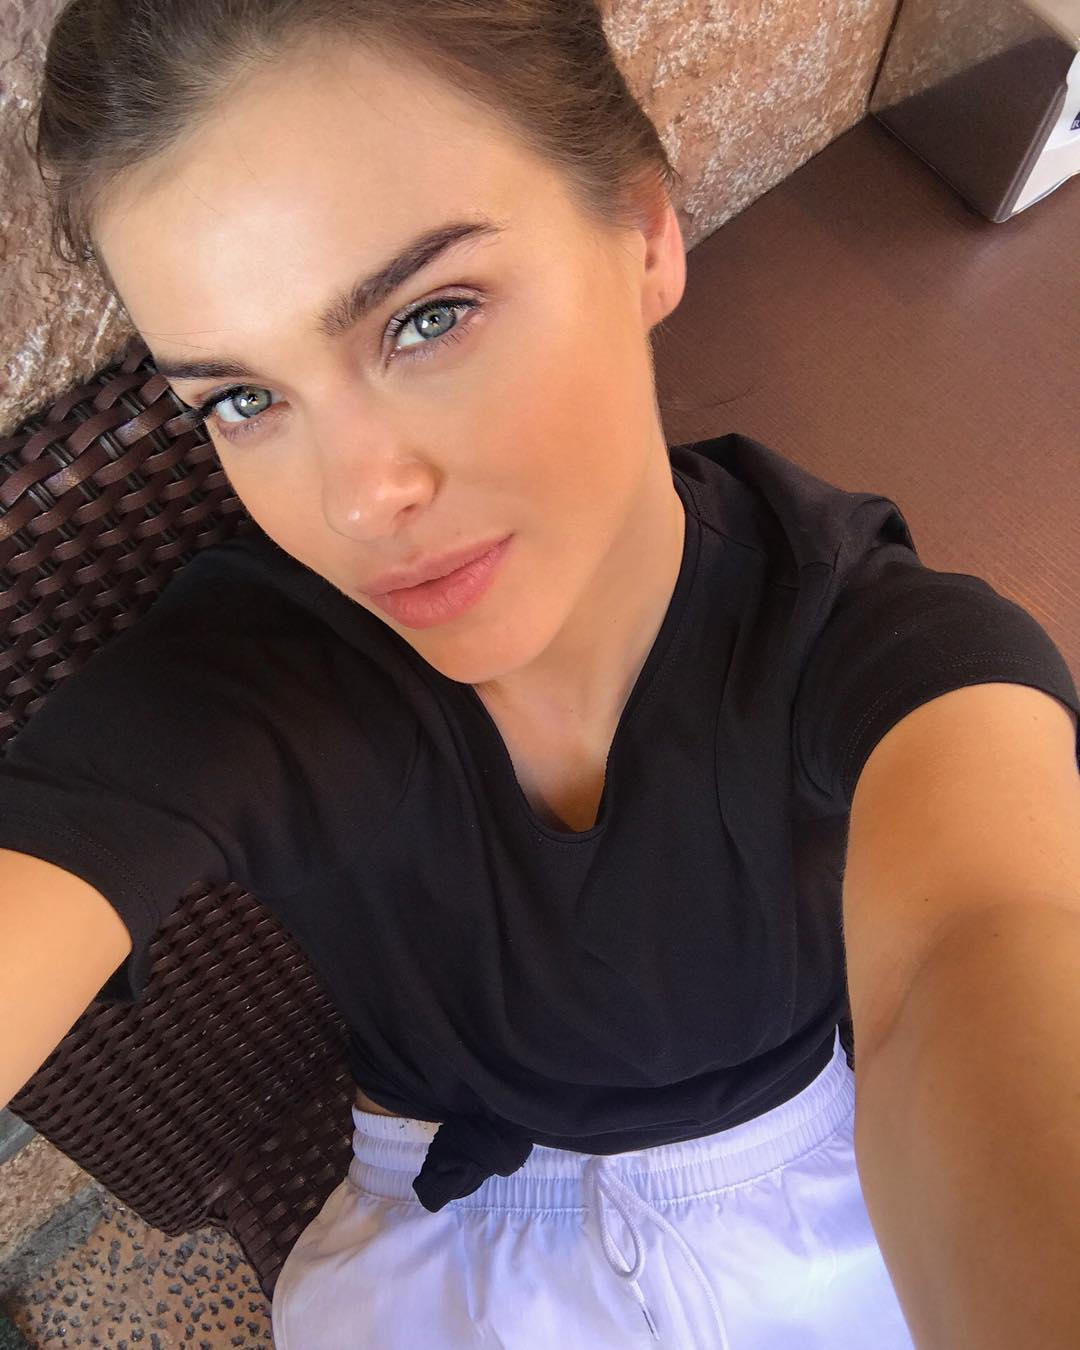 Елена Темникова показала себя фанатам без макияжа»